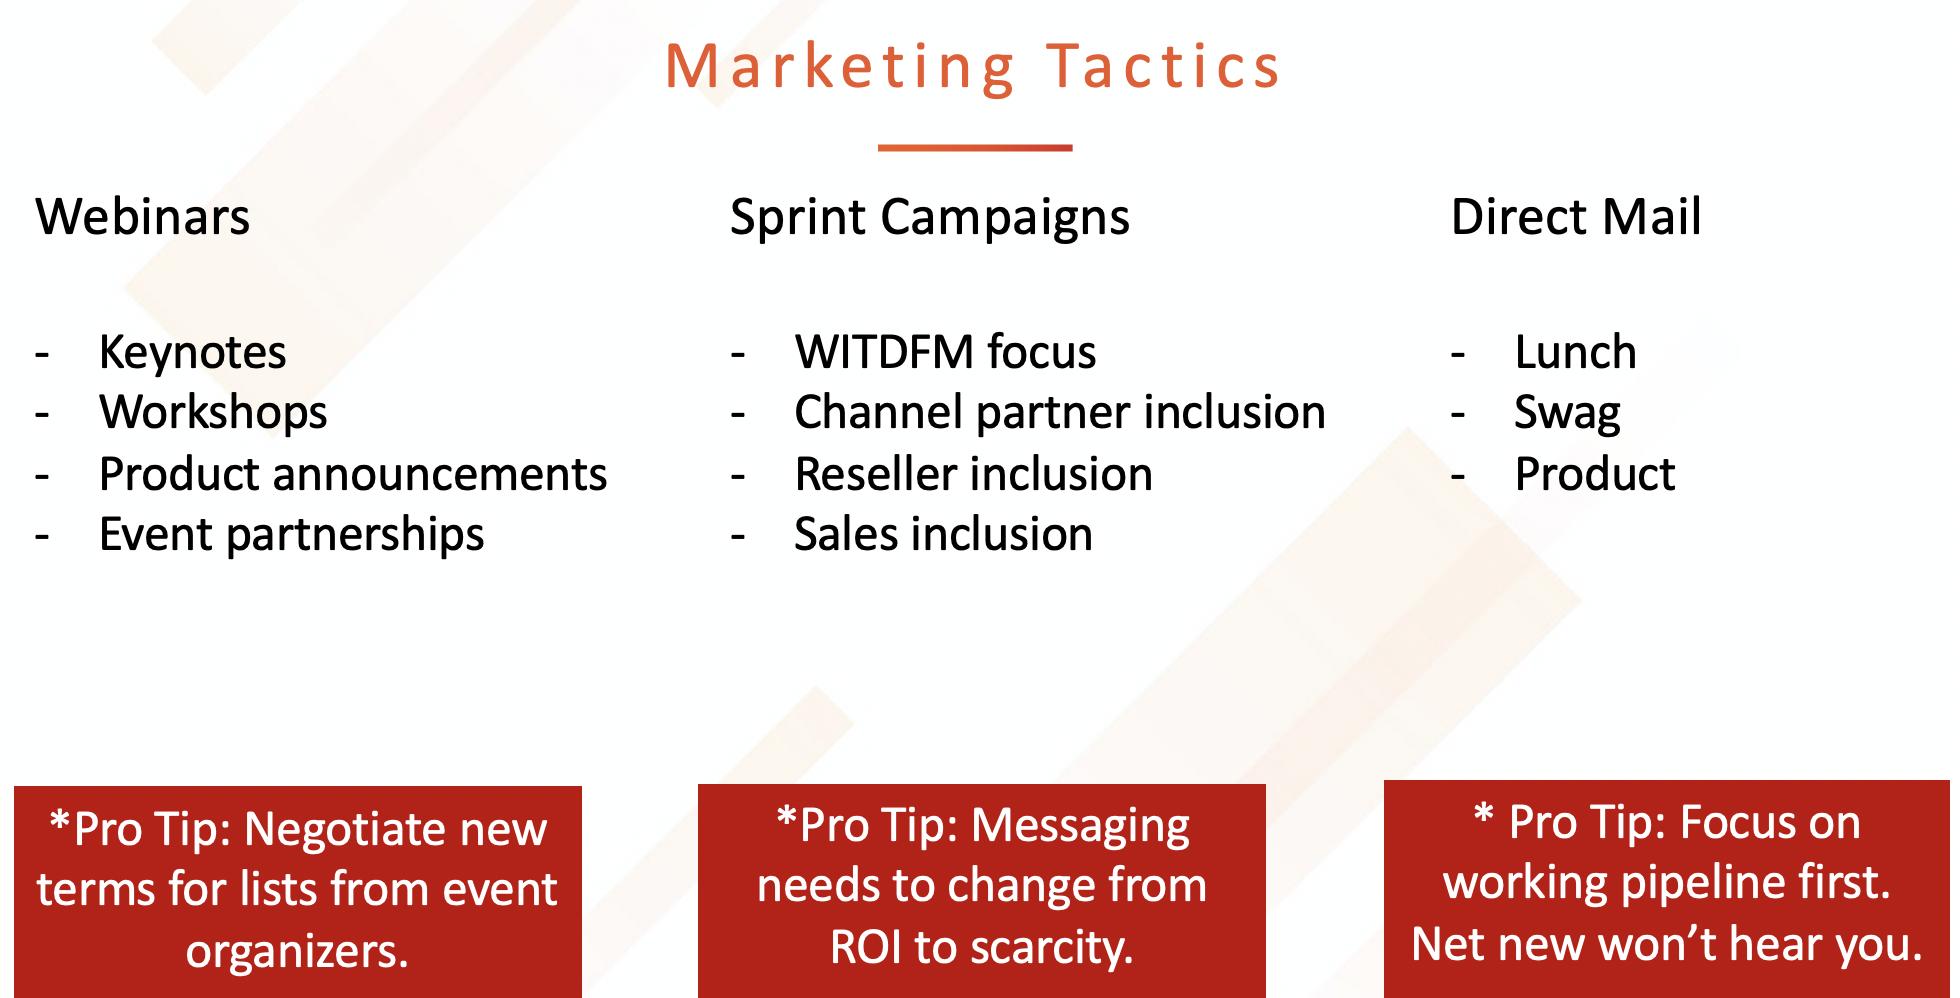 Types of Marketing Tactics